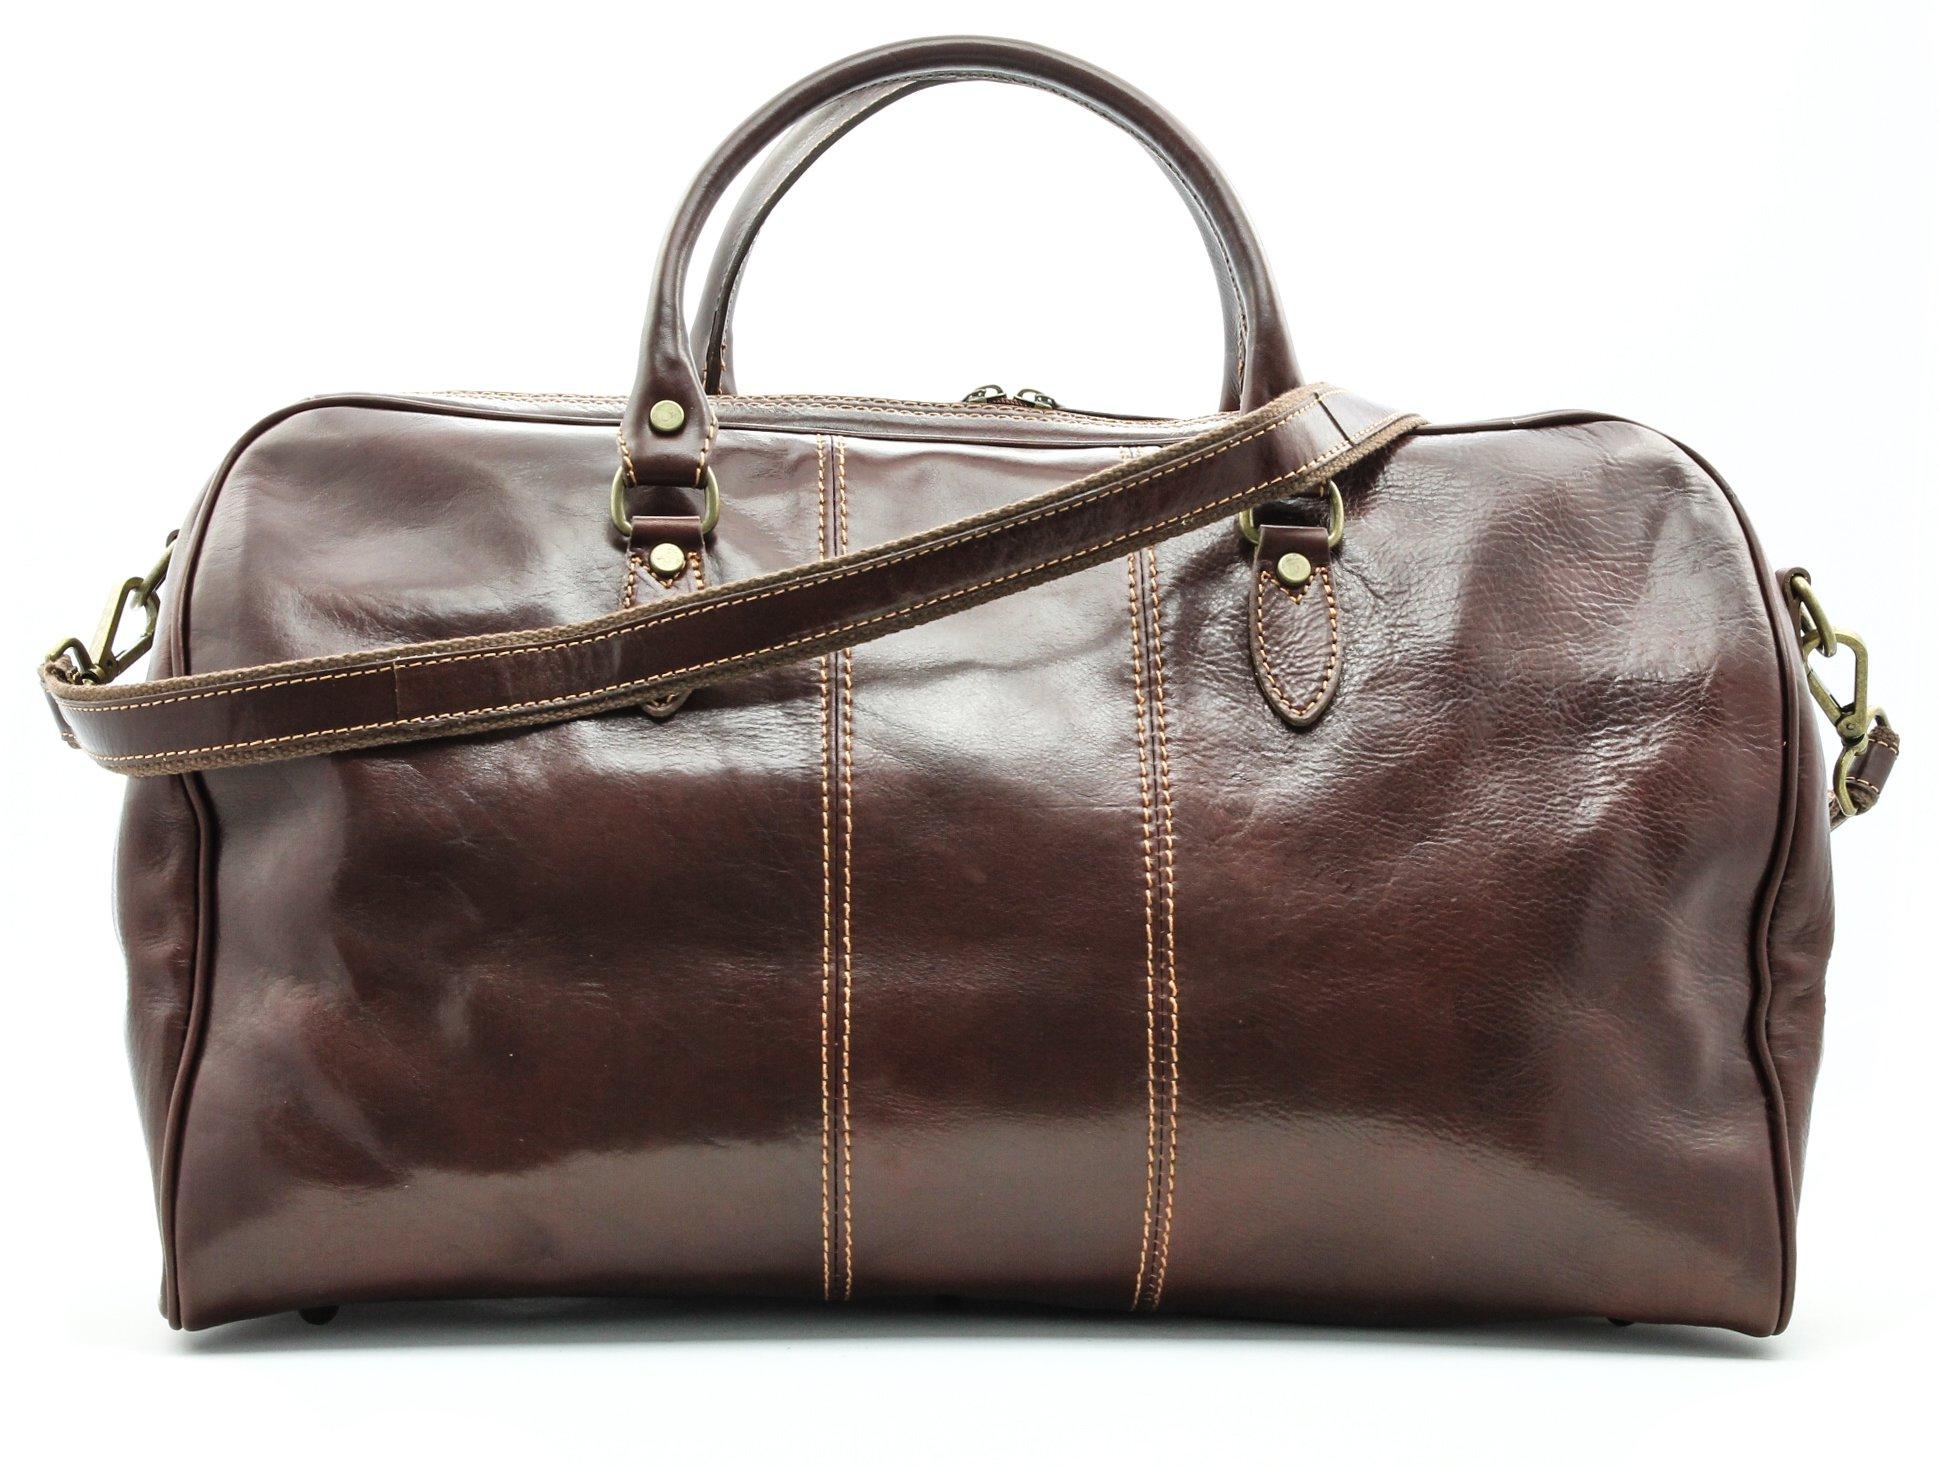 Alberto Bellucci Unisex Italian Leather Verona Full Zip Around Traveler Duffel Bag in Brown